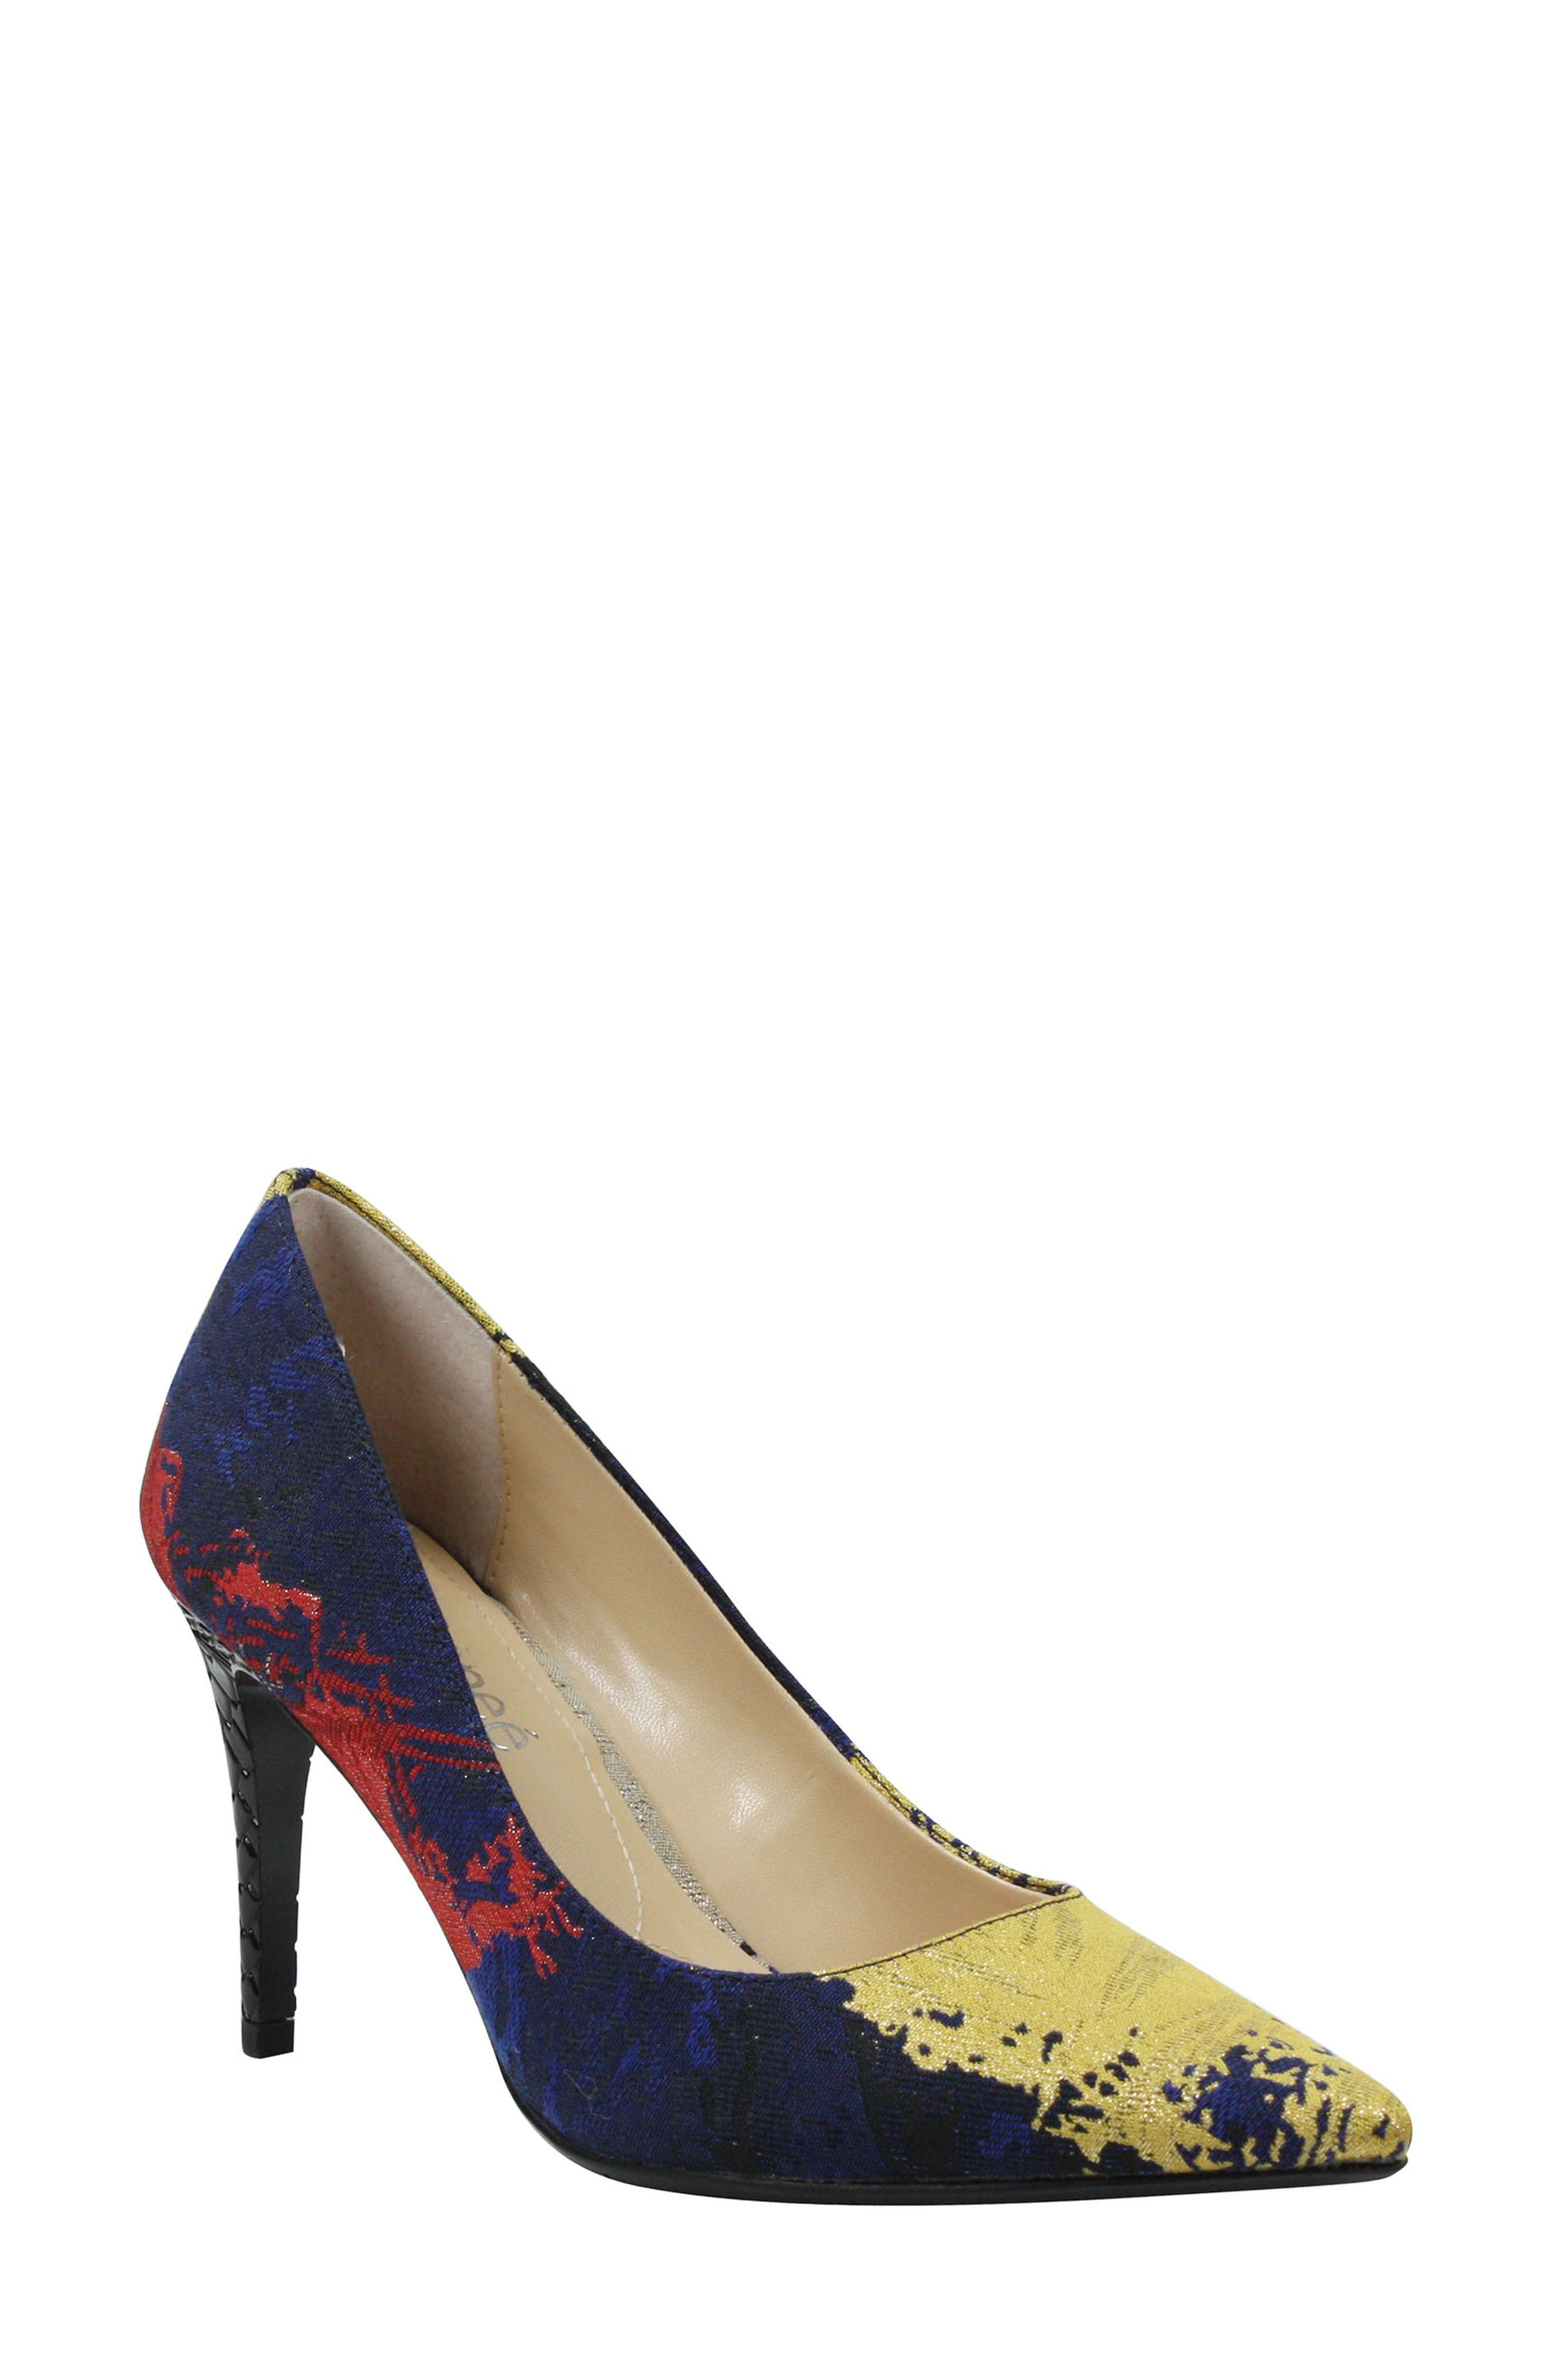 J. RENEÉ 'Maressa' Pointy Toe Pump, Main, color, BLUE/ BLACK MULTI